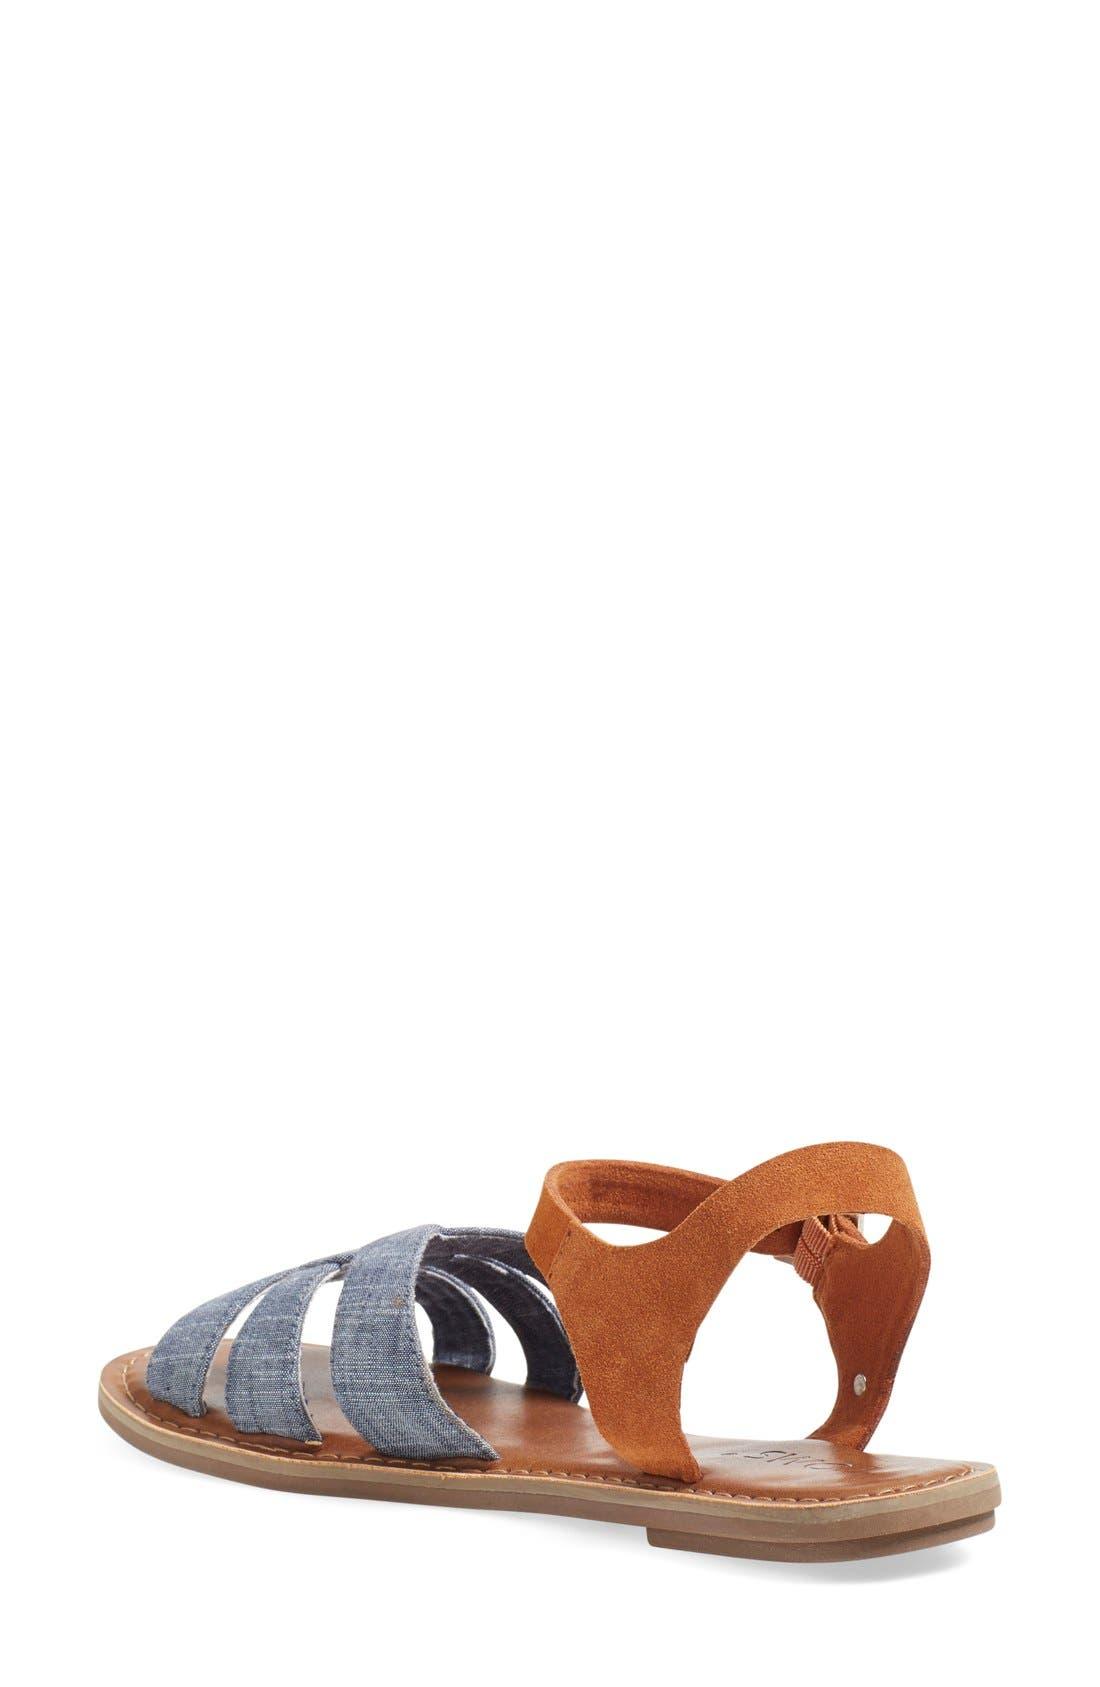 Alternate Image 2  - TOMS 'Zoe' Chambray Flat Quarter Strap Sandal (Women)